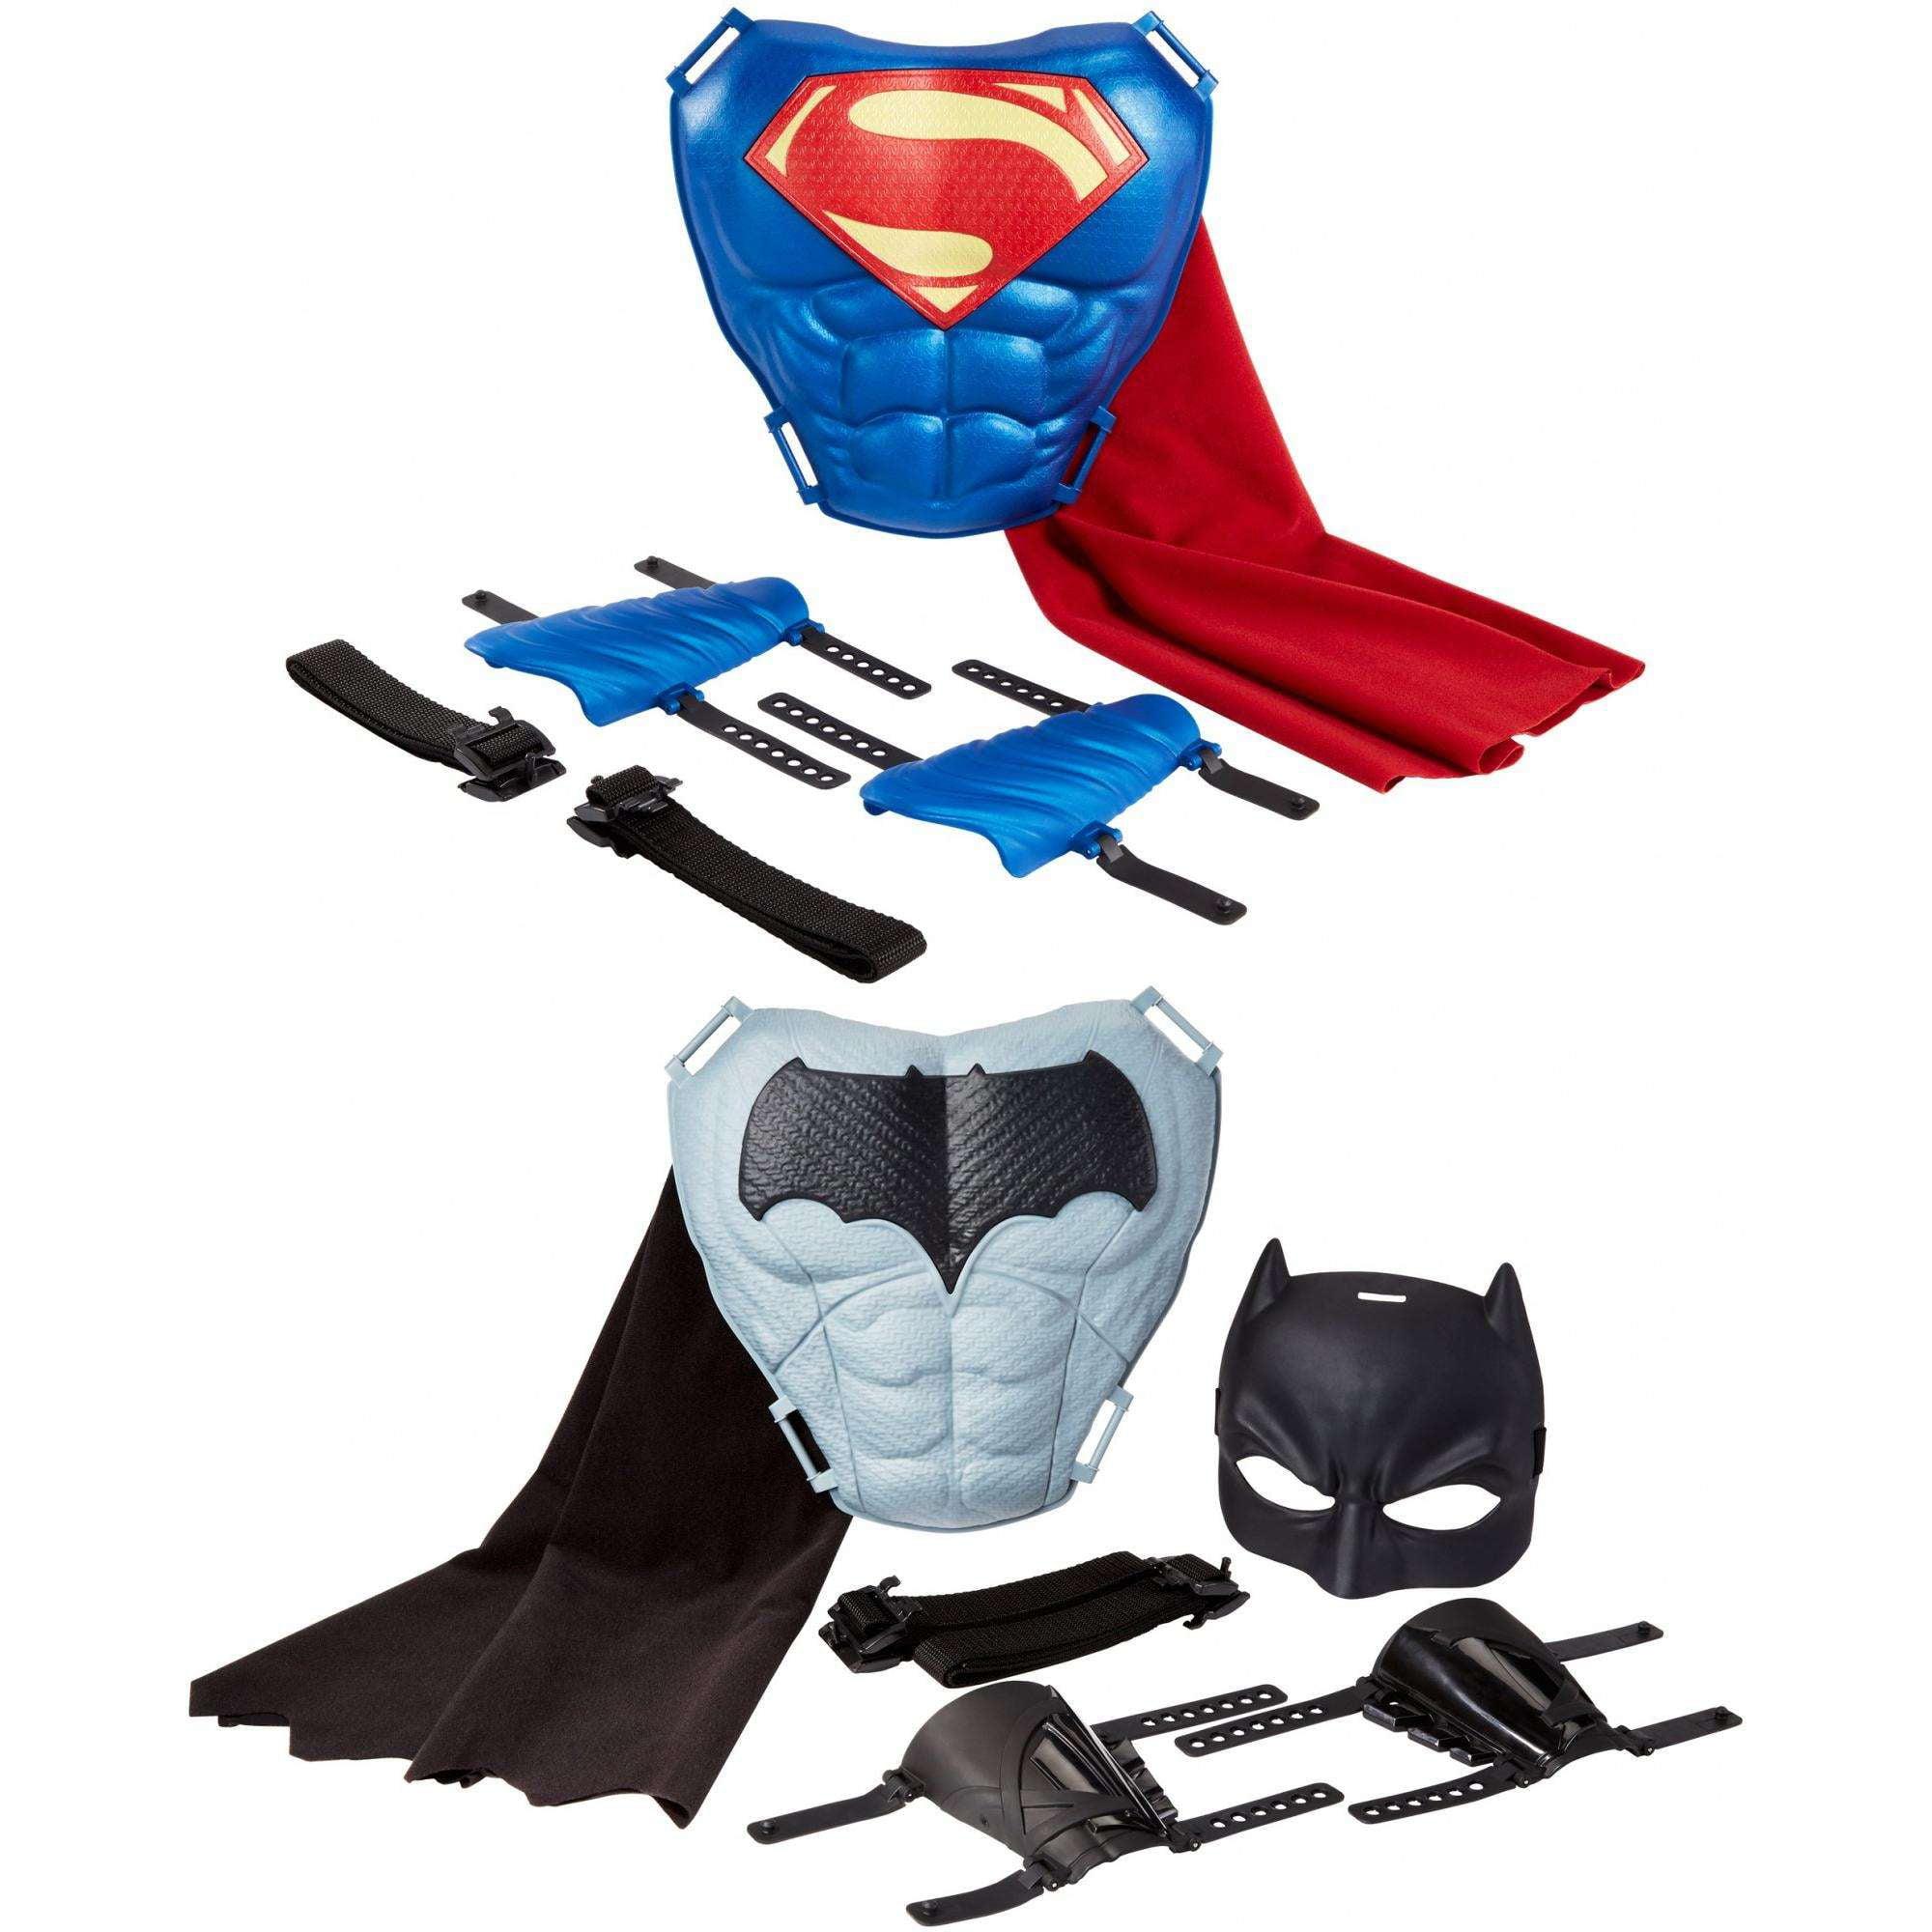 DC Justice League Batman Hero-Ready Set